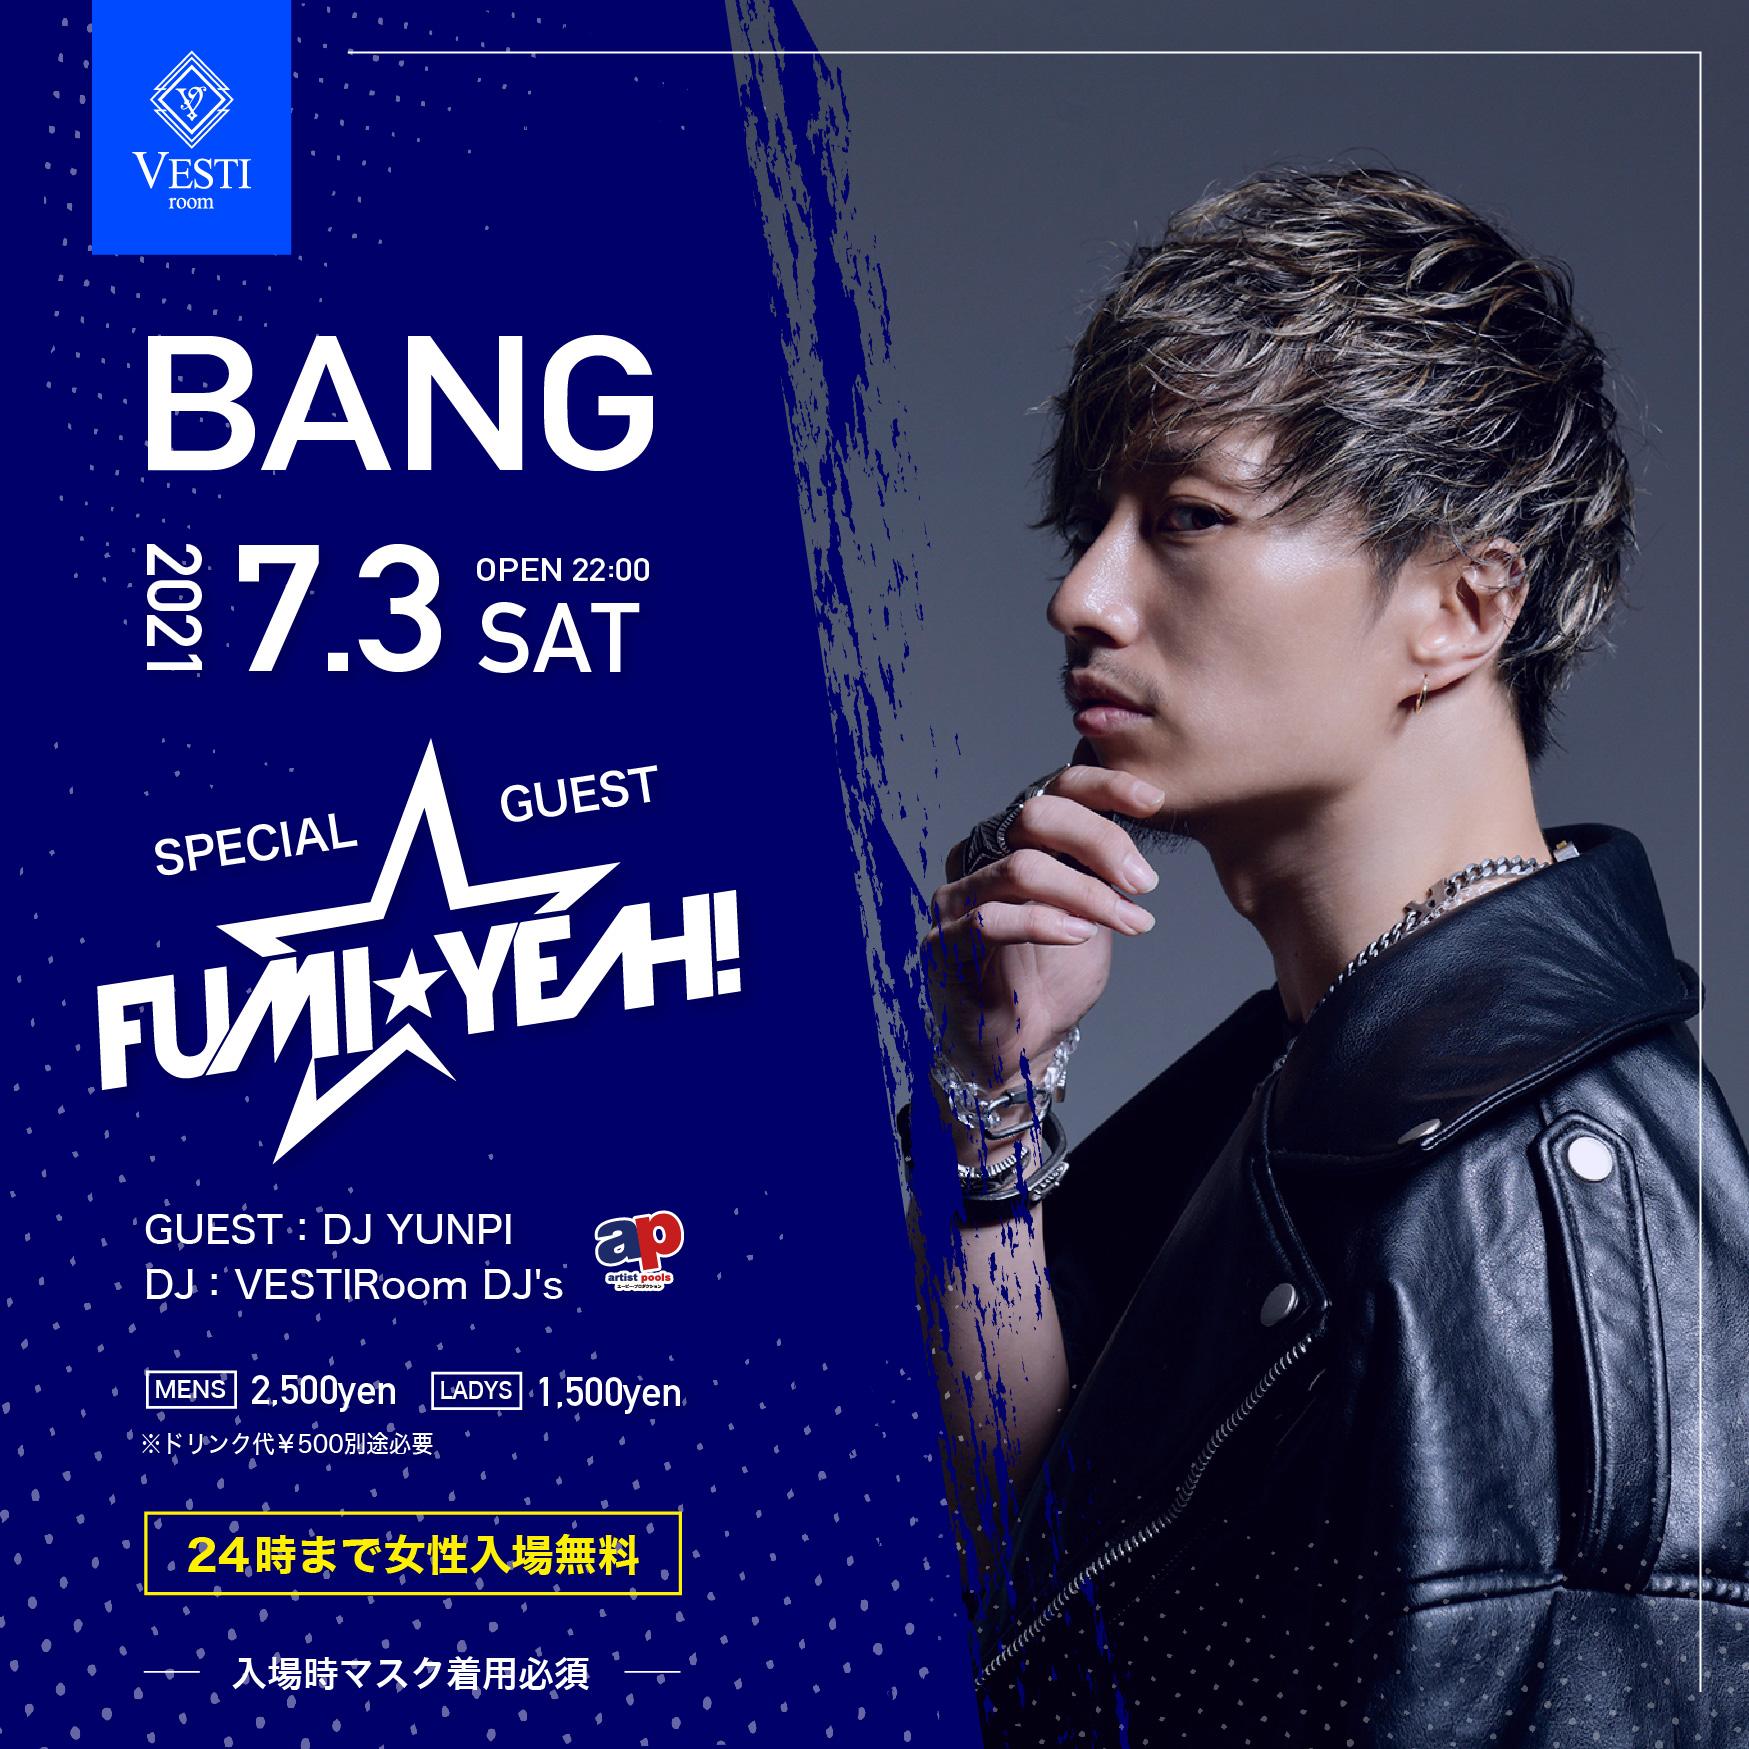 BANG~Special Guest : DJ FUMI YEAH~ 24時まで女性入場無料